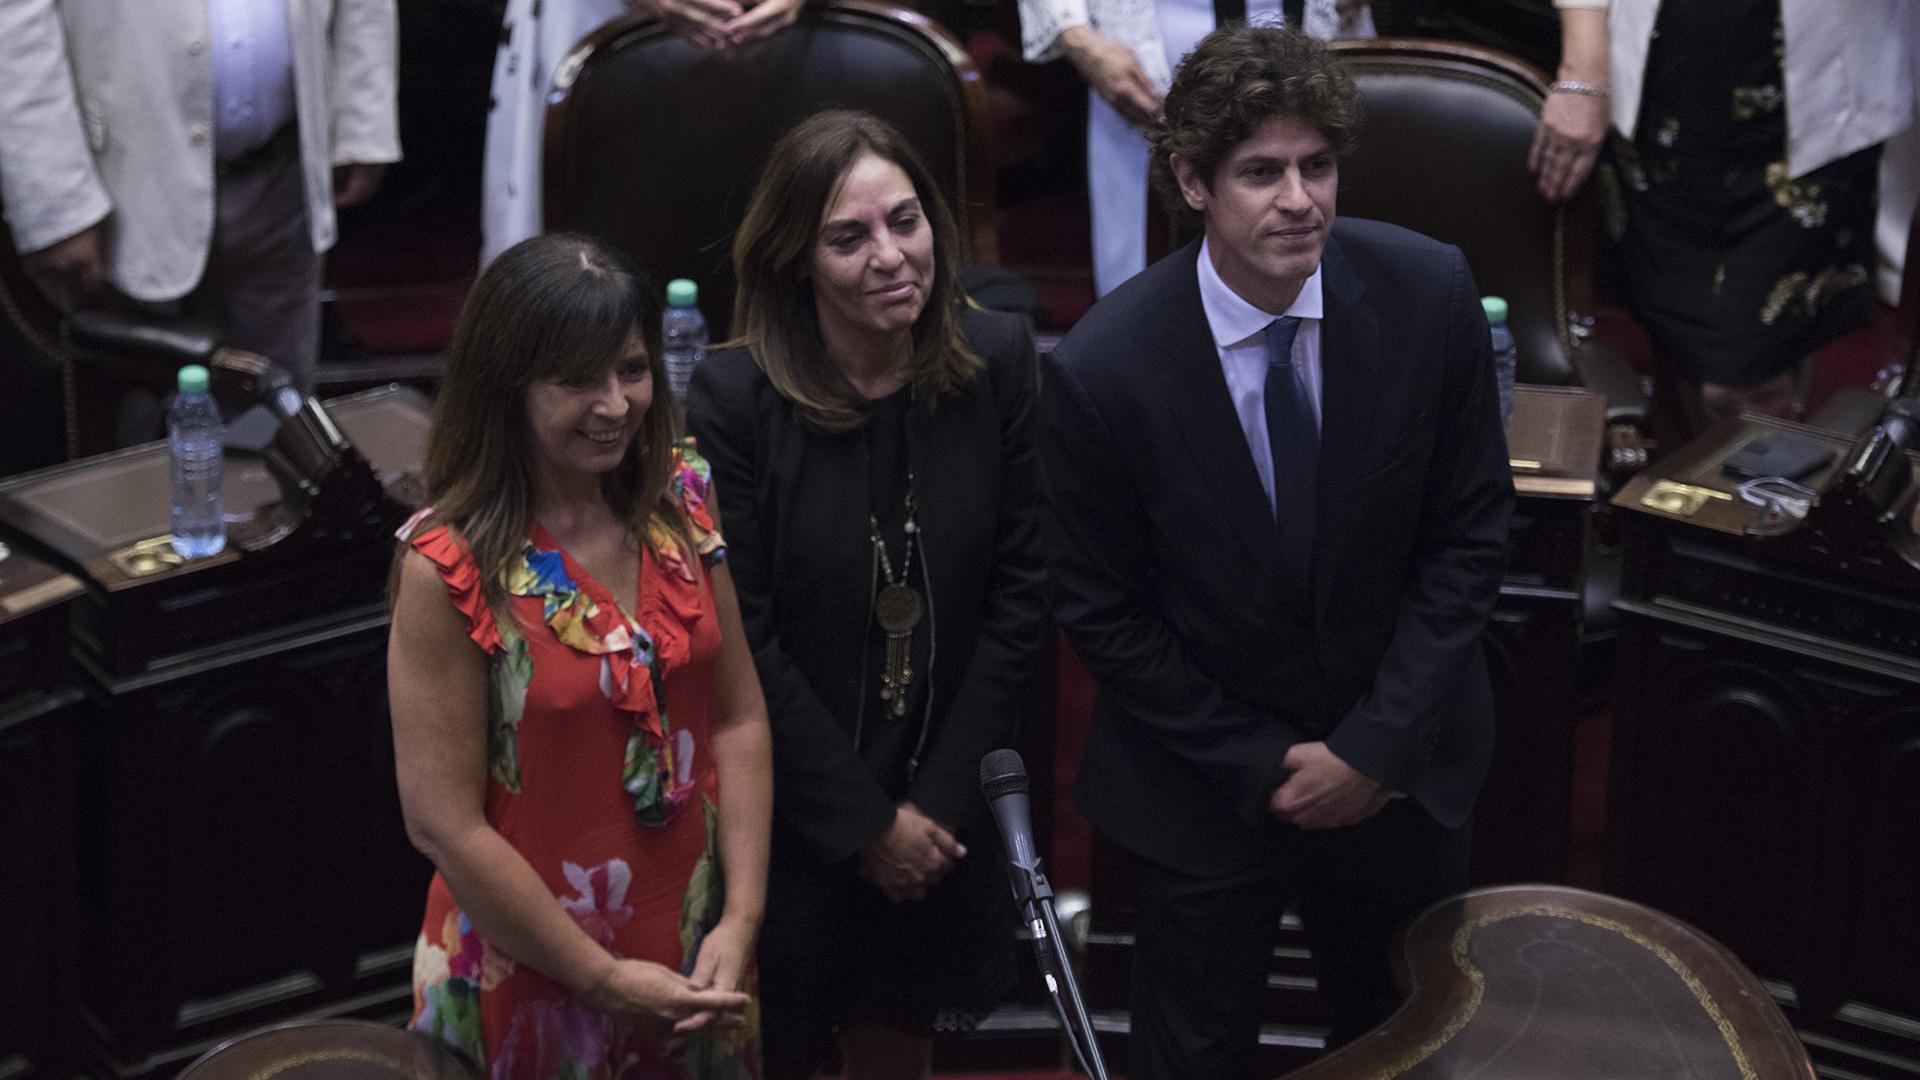 Los diputados Gabriela Cerruti , Carla Carrizo y Martín Lousteau